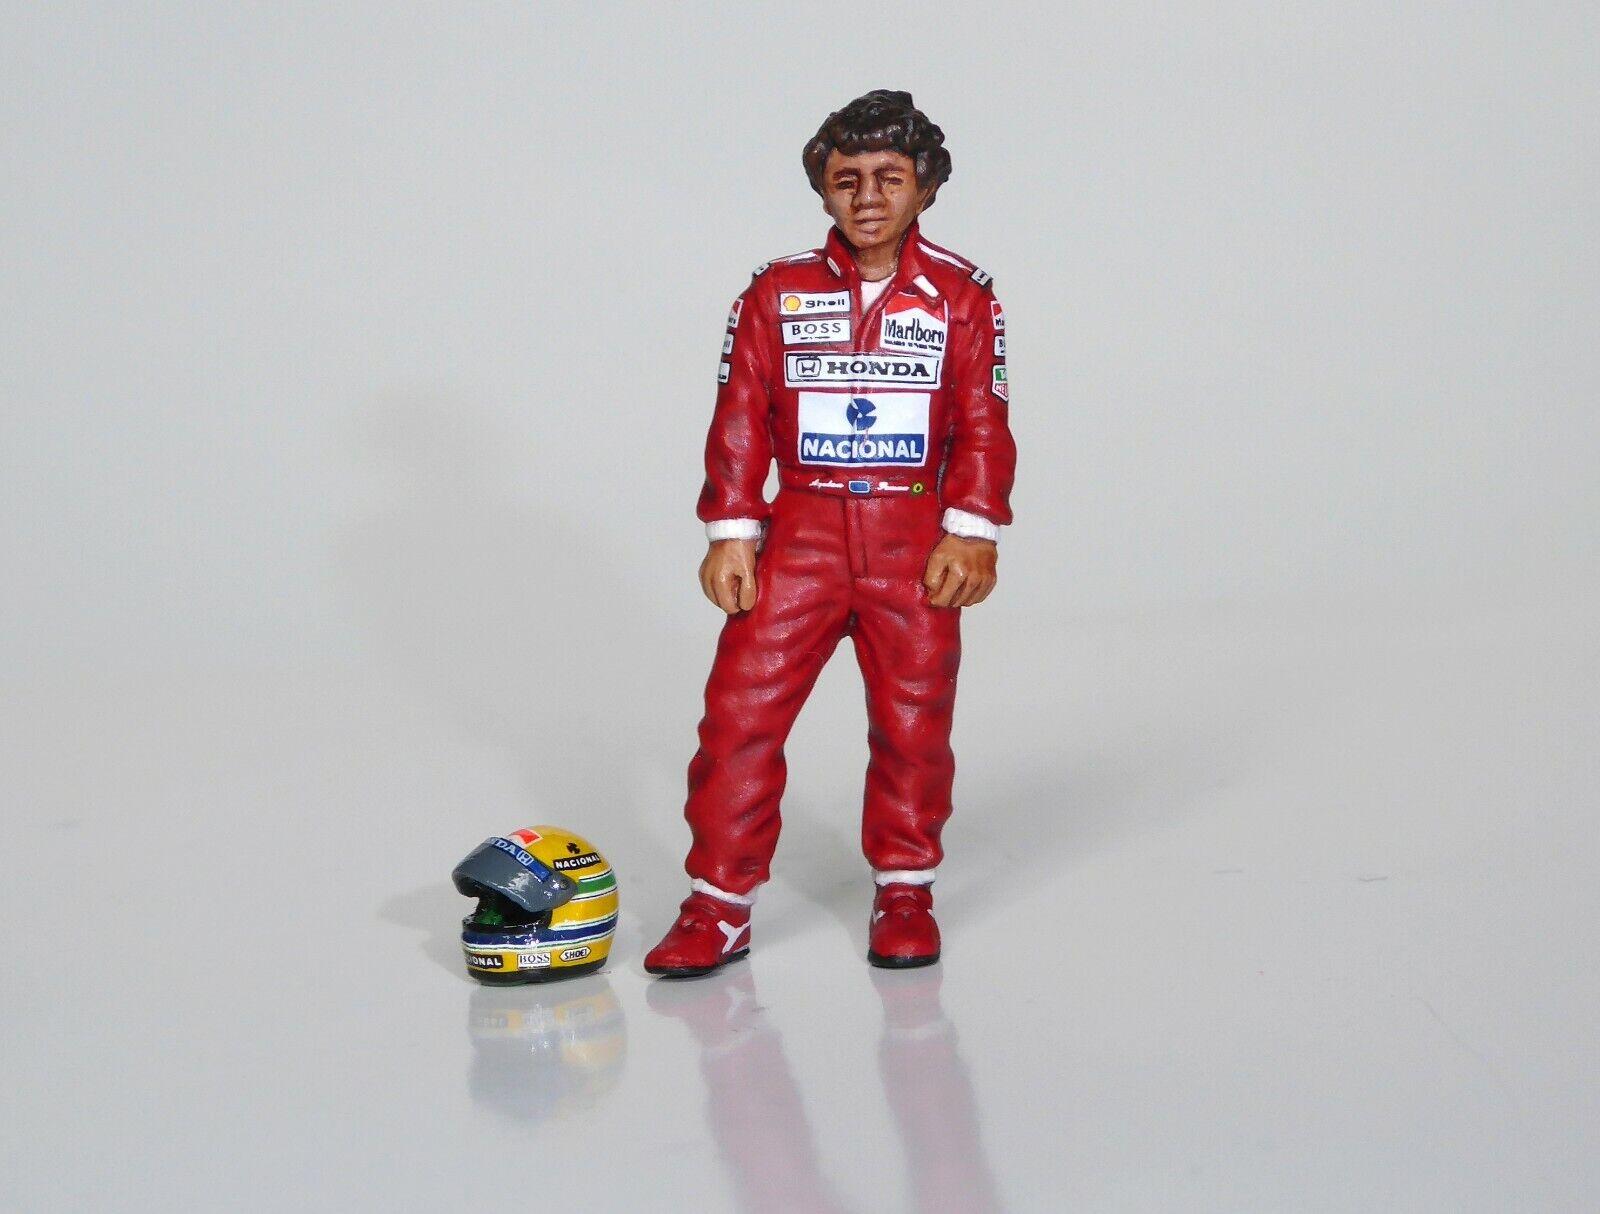 1 43 Ayrton Senna McLaren Honda figurine figure standing 2 1988 1989 1990 1991